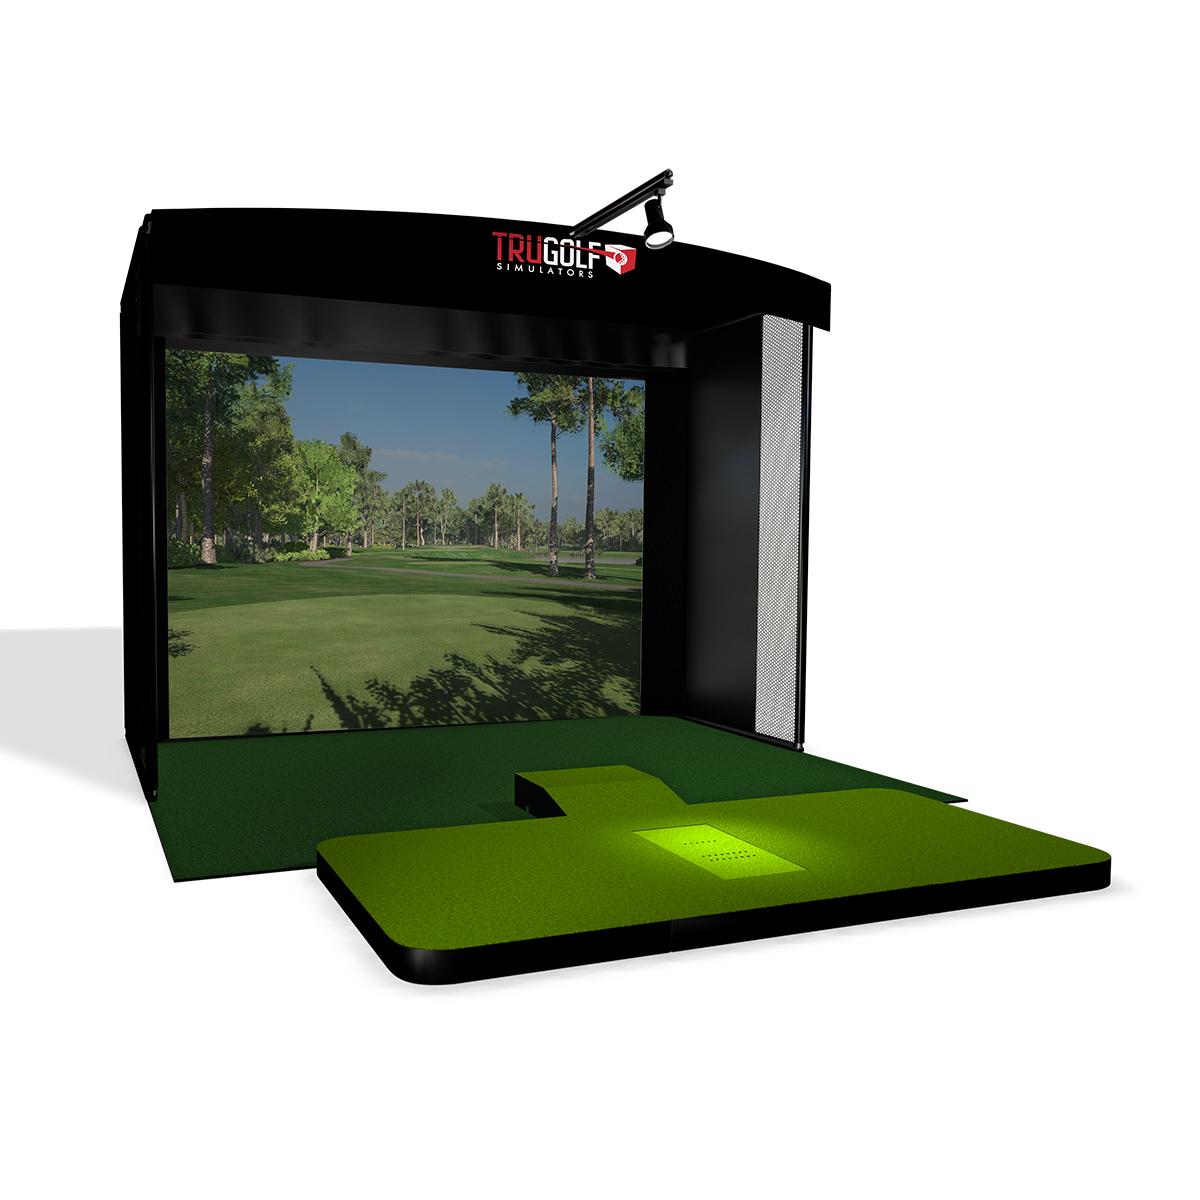 Top Golf Simulators and Golf Video Games In Metro Detroit | Game Room Guys